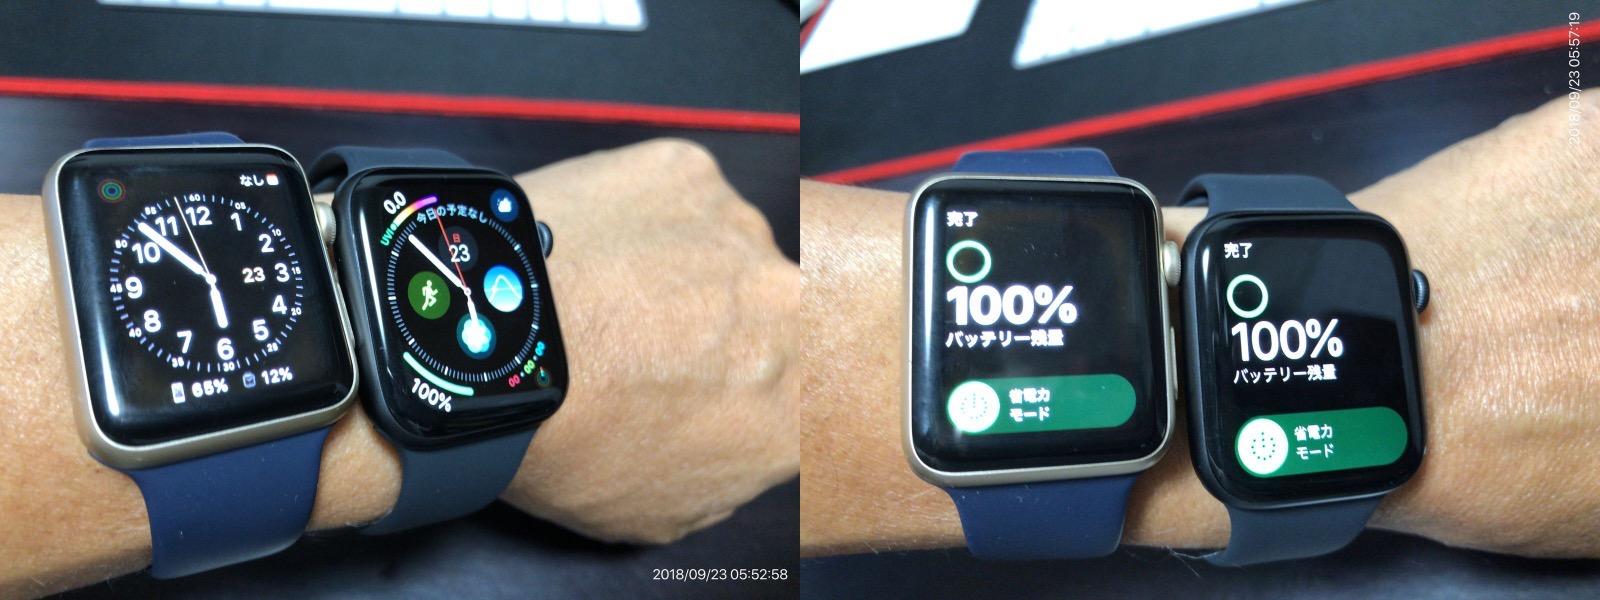 Apple Watch Series 4 -1